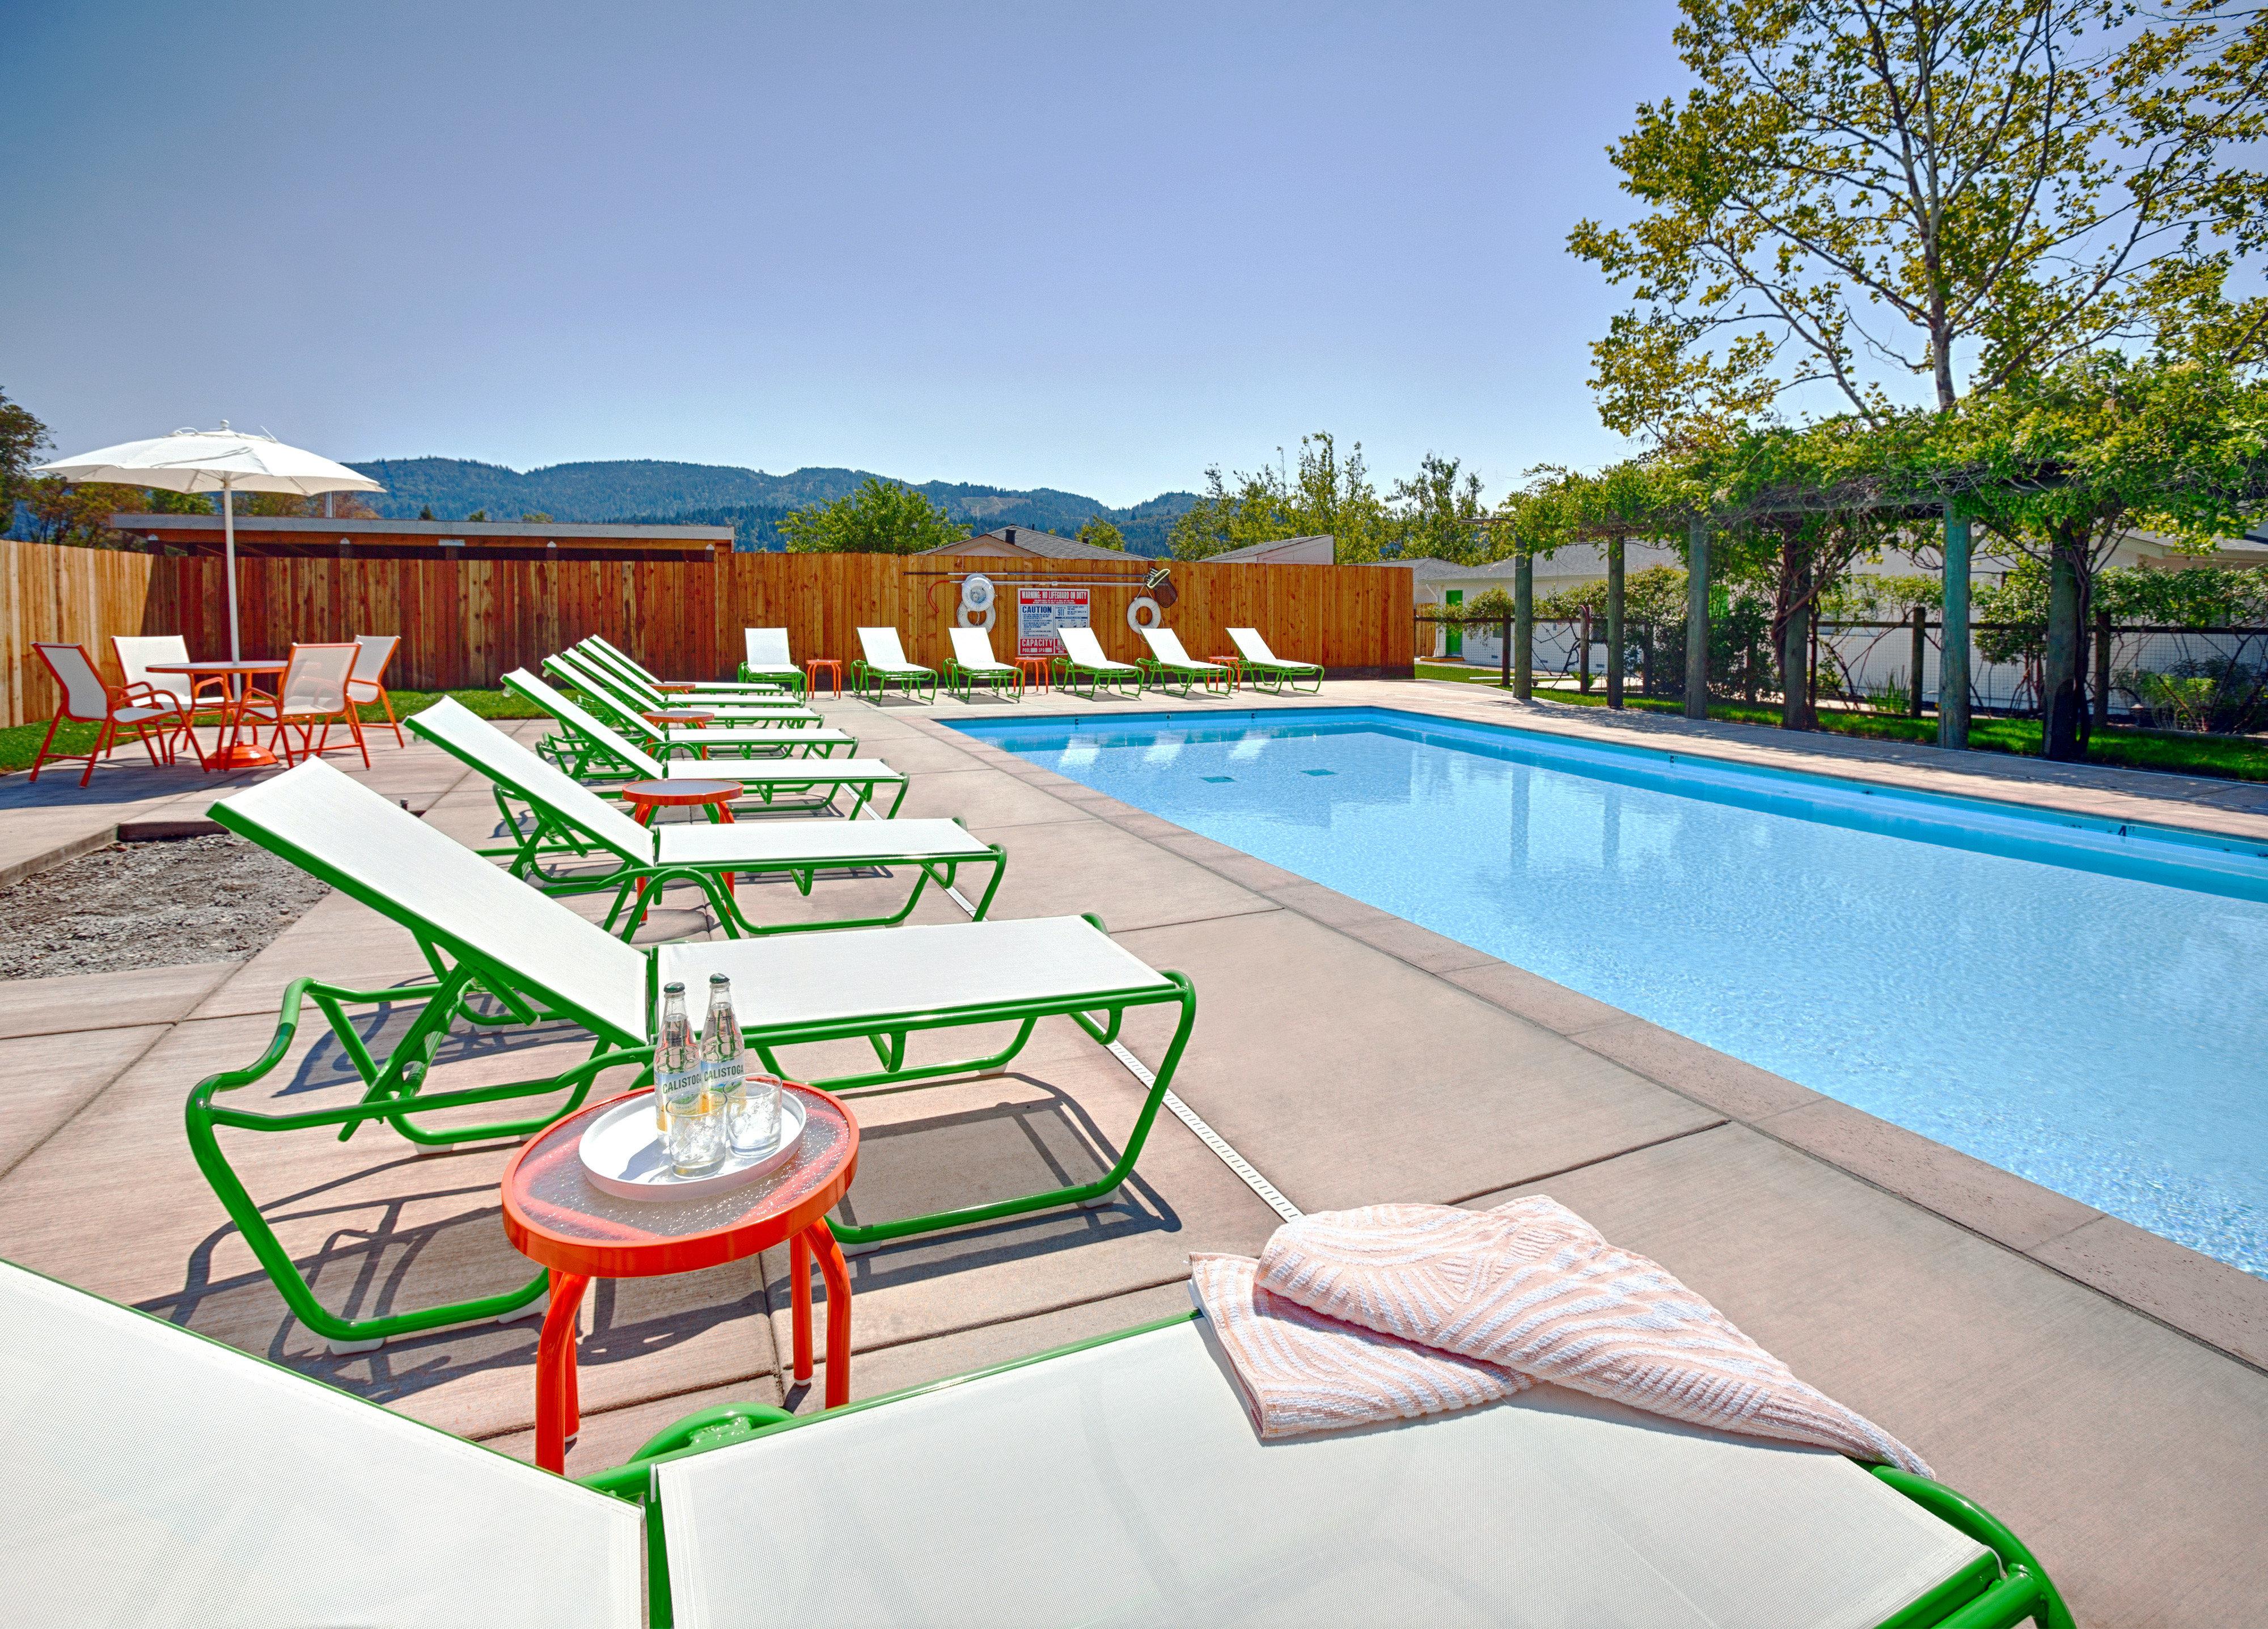 Deck Lounge Modern Patio Pool sky ground leisure swimming pool property Resort Water park backyard condominium